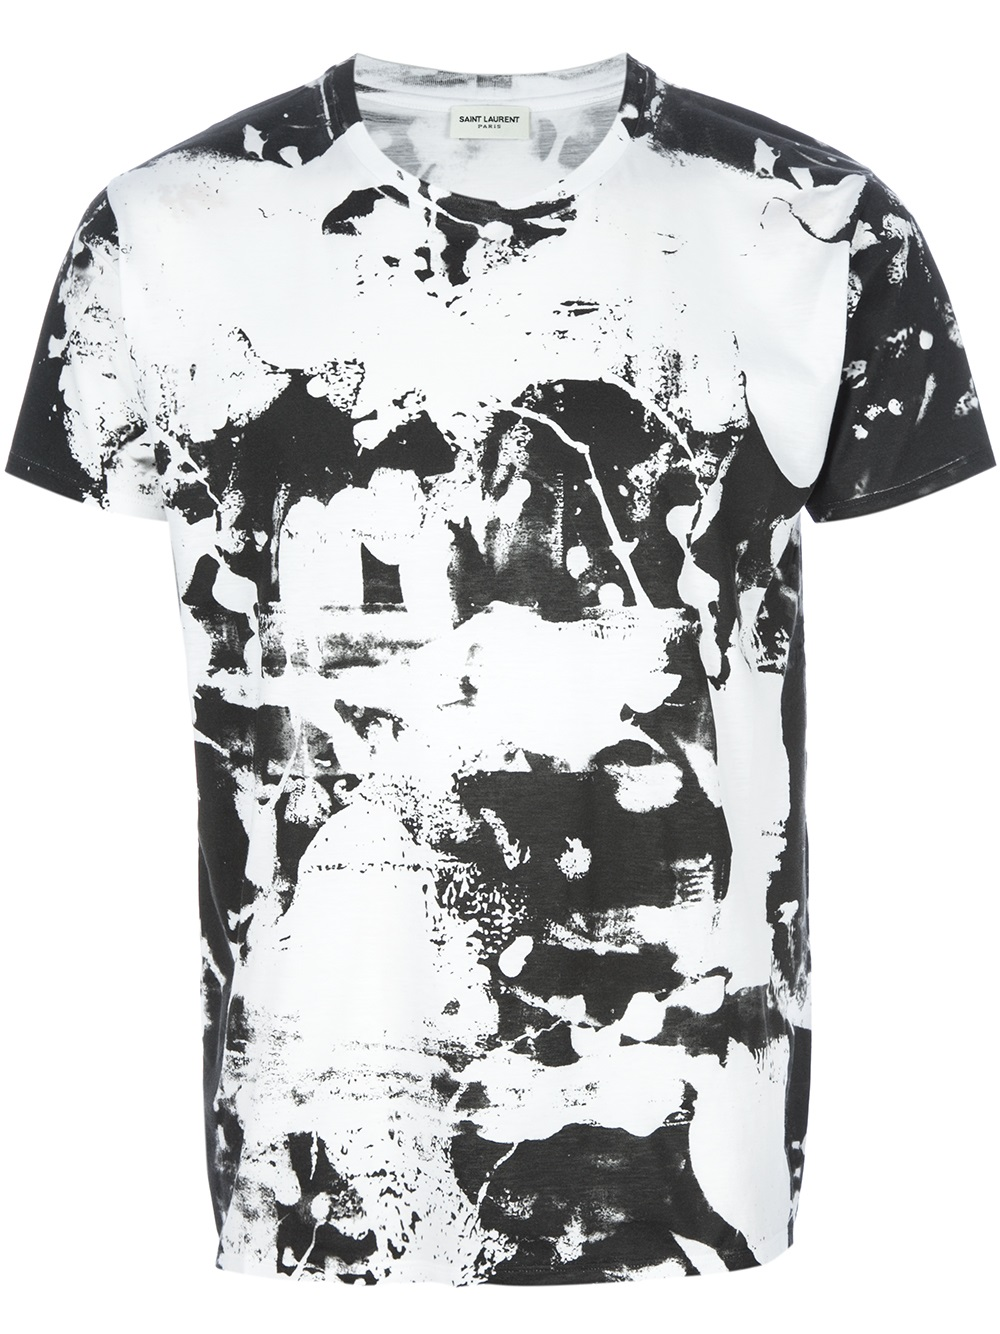 lyst saint laurent monochrome t shirt in white for men. Black Bedroom Furniture Sets. Home Design Ideas